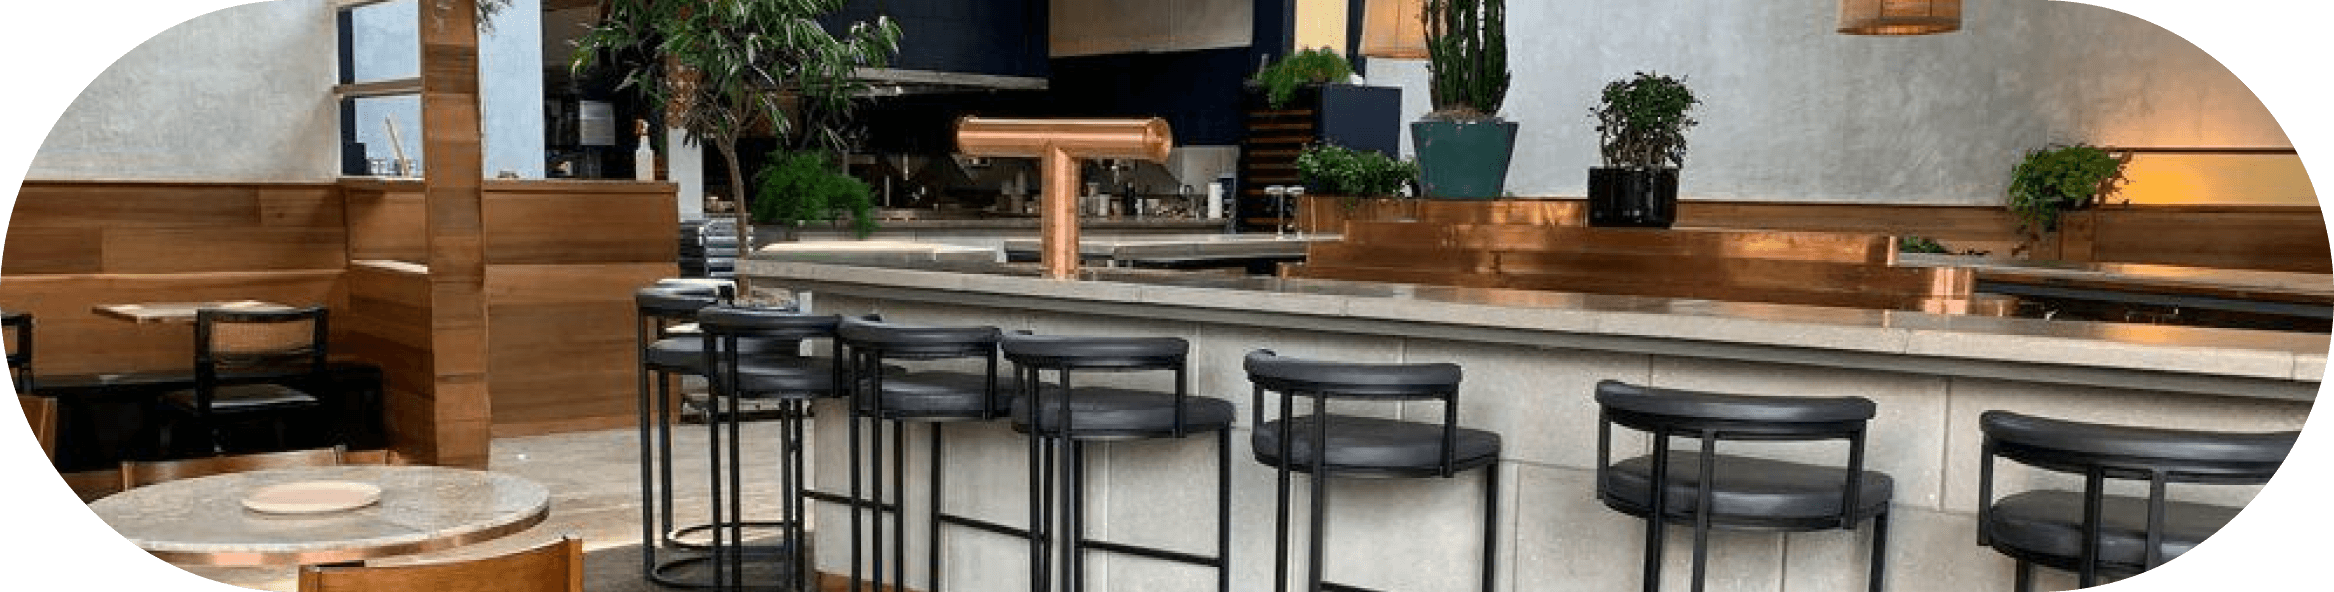 Nura BK - A Neighborhood restaurant in Greenpoint